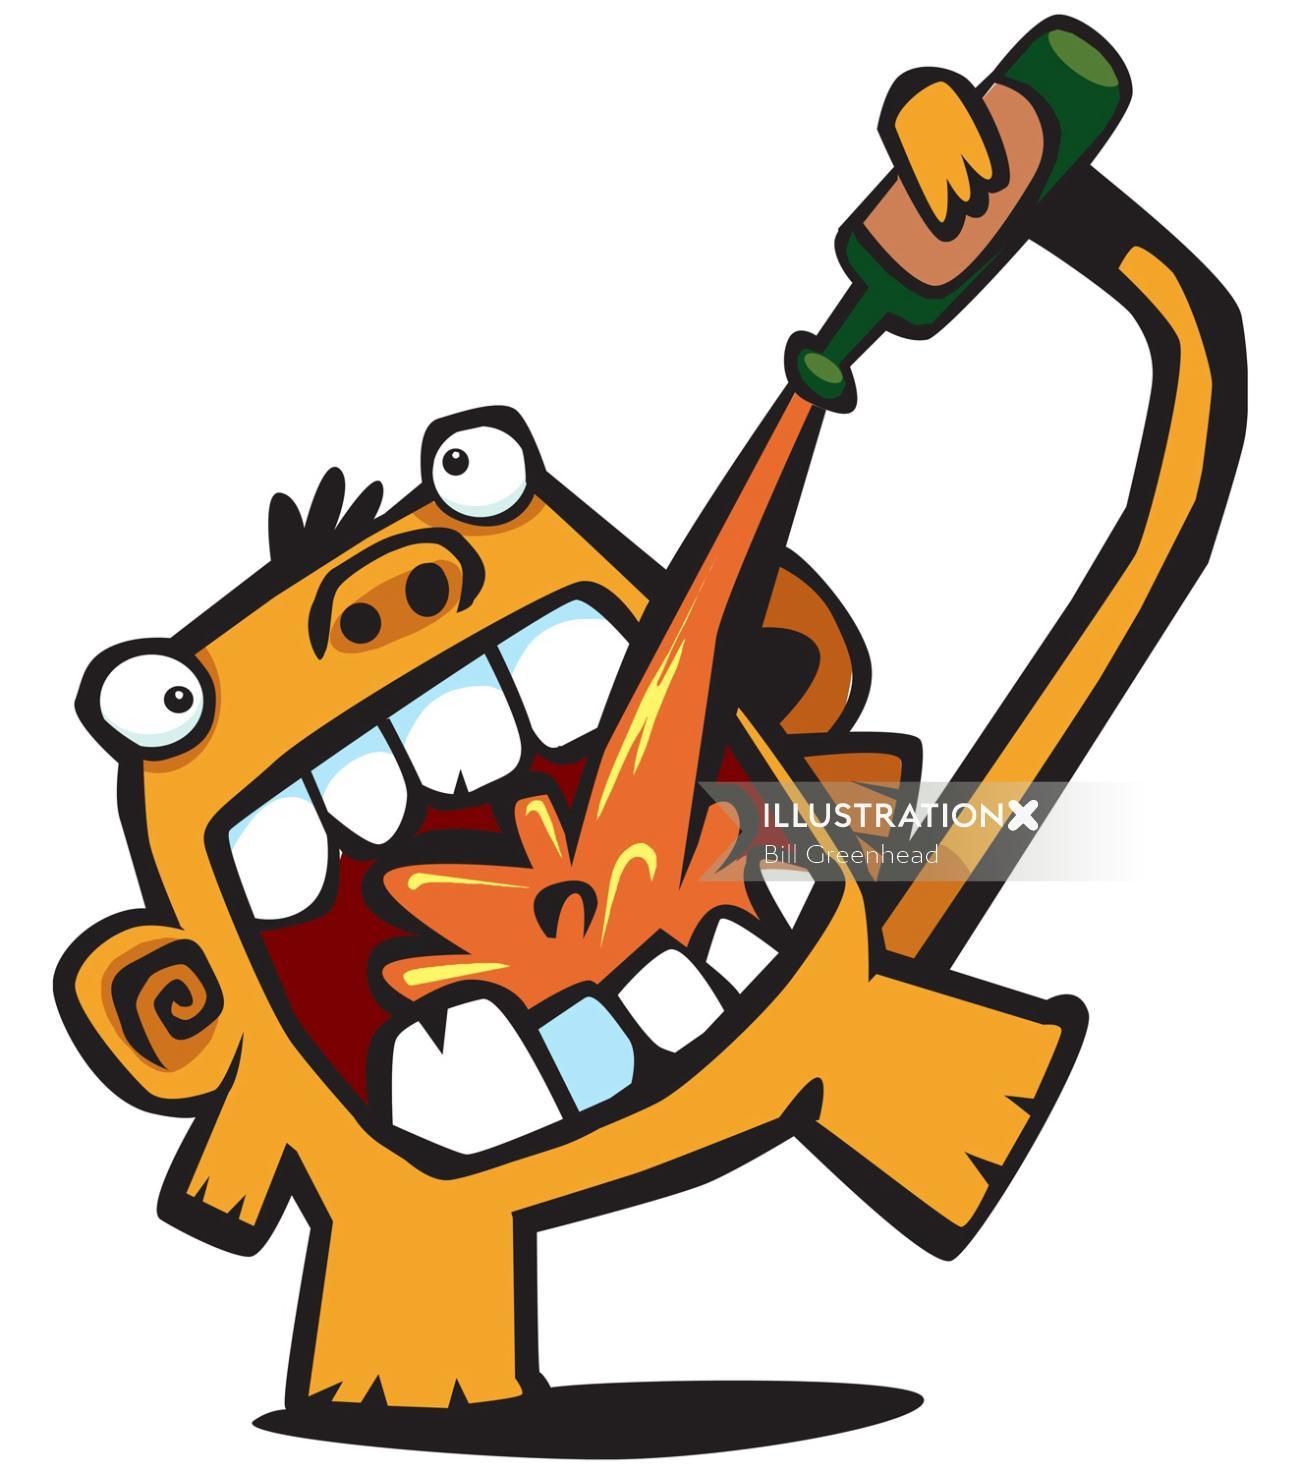 Beer monkey illustration